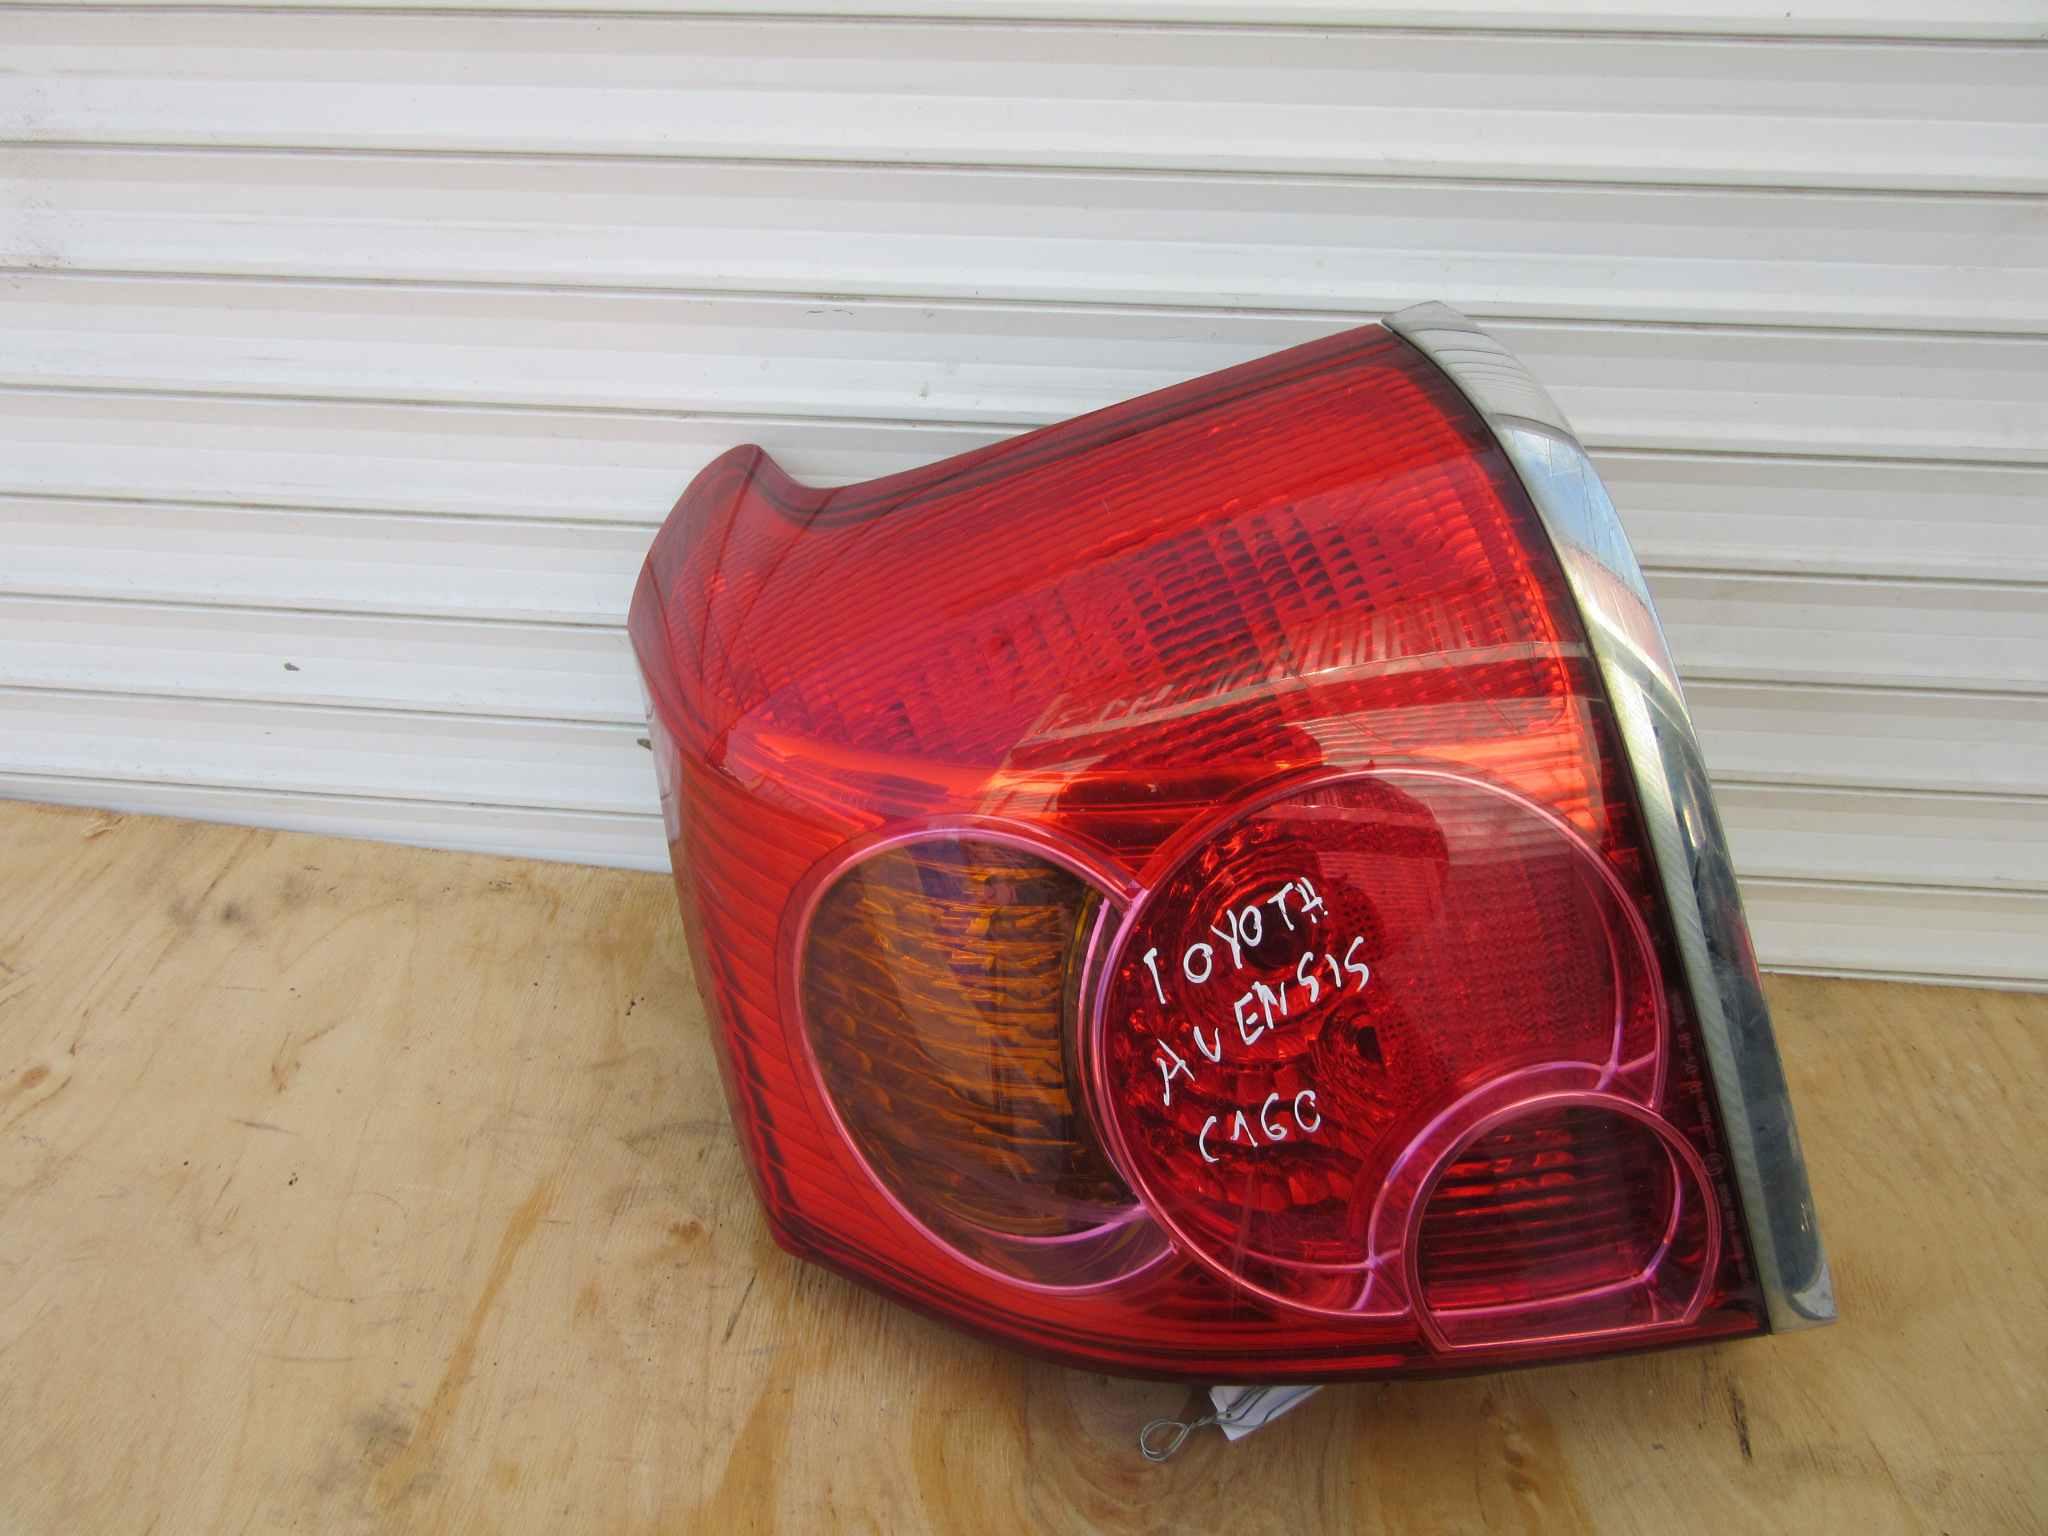 задний фонарь Toyota Авенсис #11